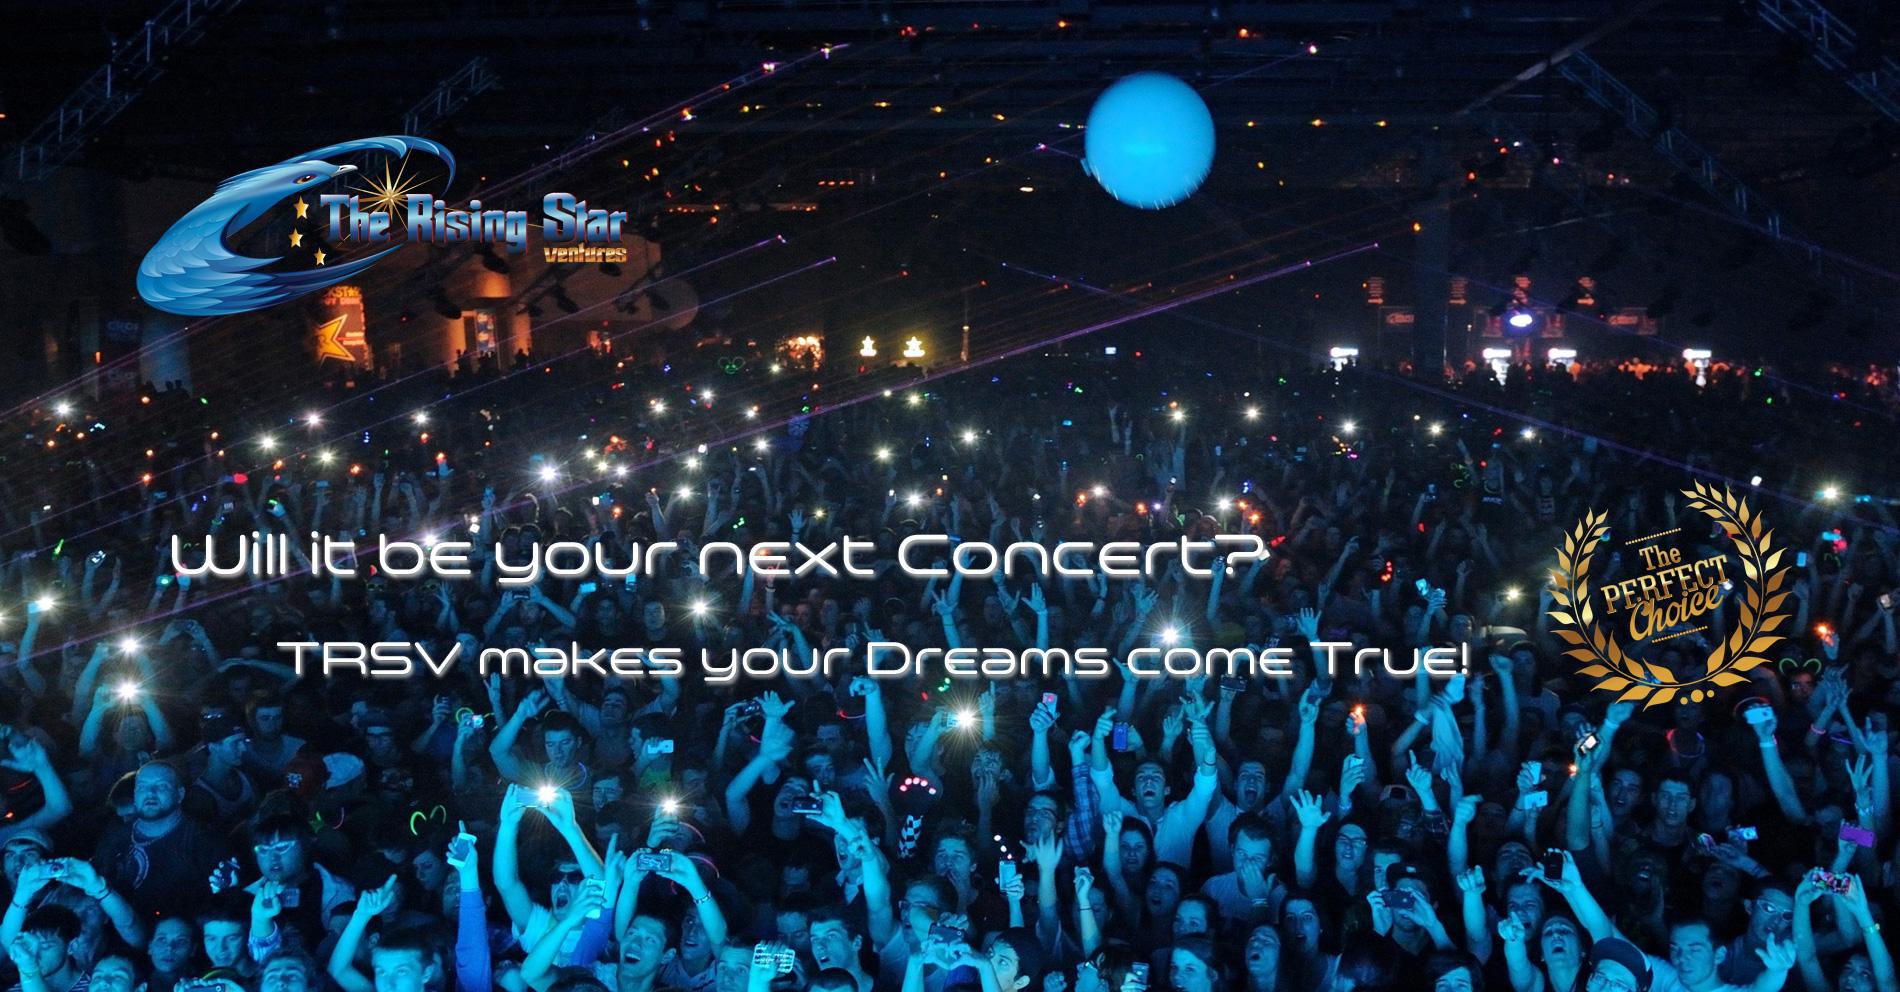 TRSV_Next_Concert.jpg